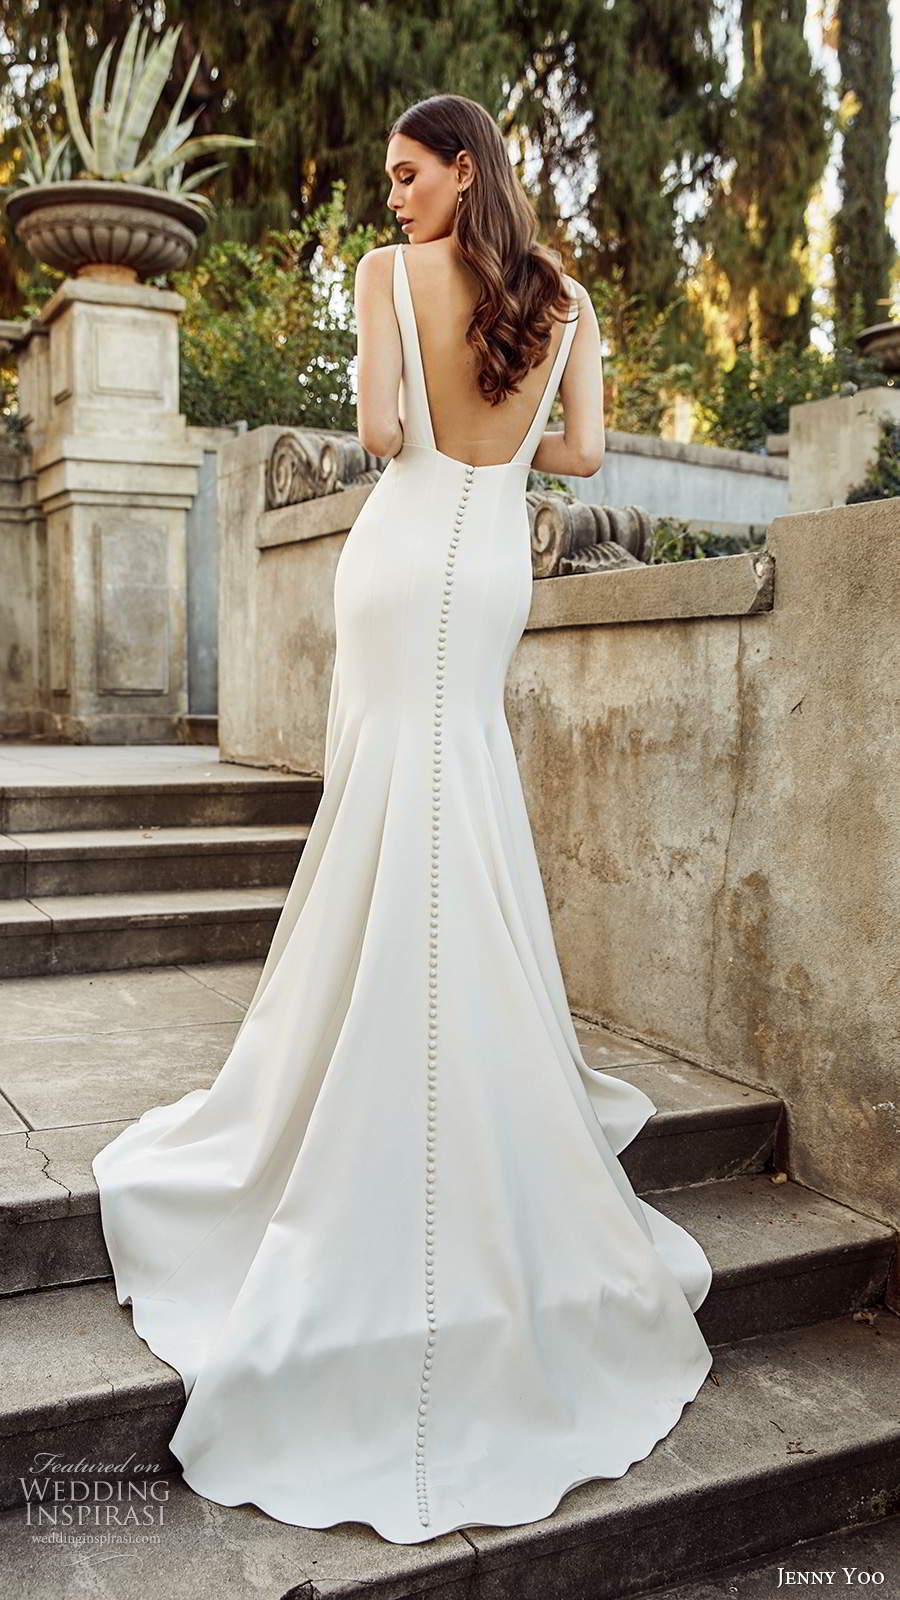 jenny yoo spring 2020 bridal sleeveless straps v neckline clean minimalist sheath fit flare mermaid wedding dress low back chapel train (9) mv